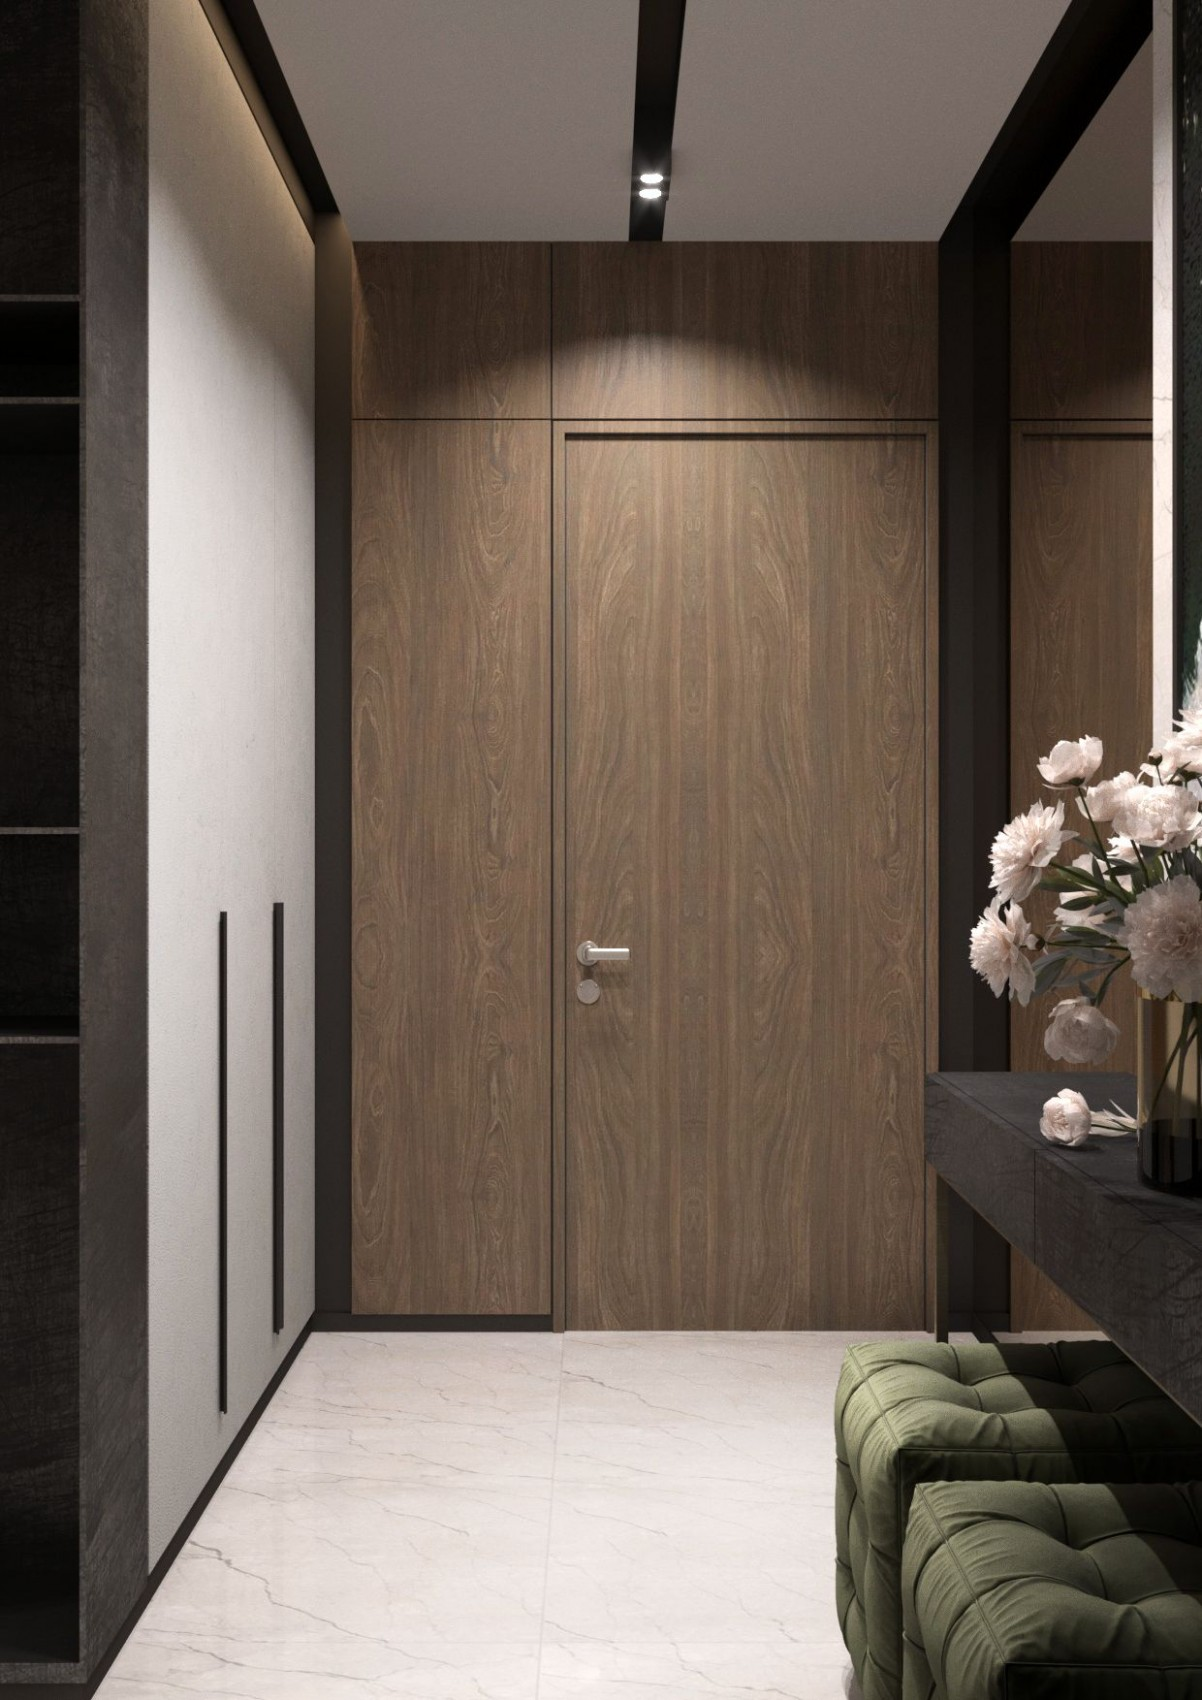 Flush door  Elegant interior design, Entrance ideas entryway  - Apartment Entrance Design Ideas